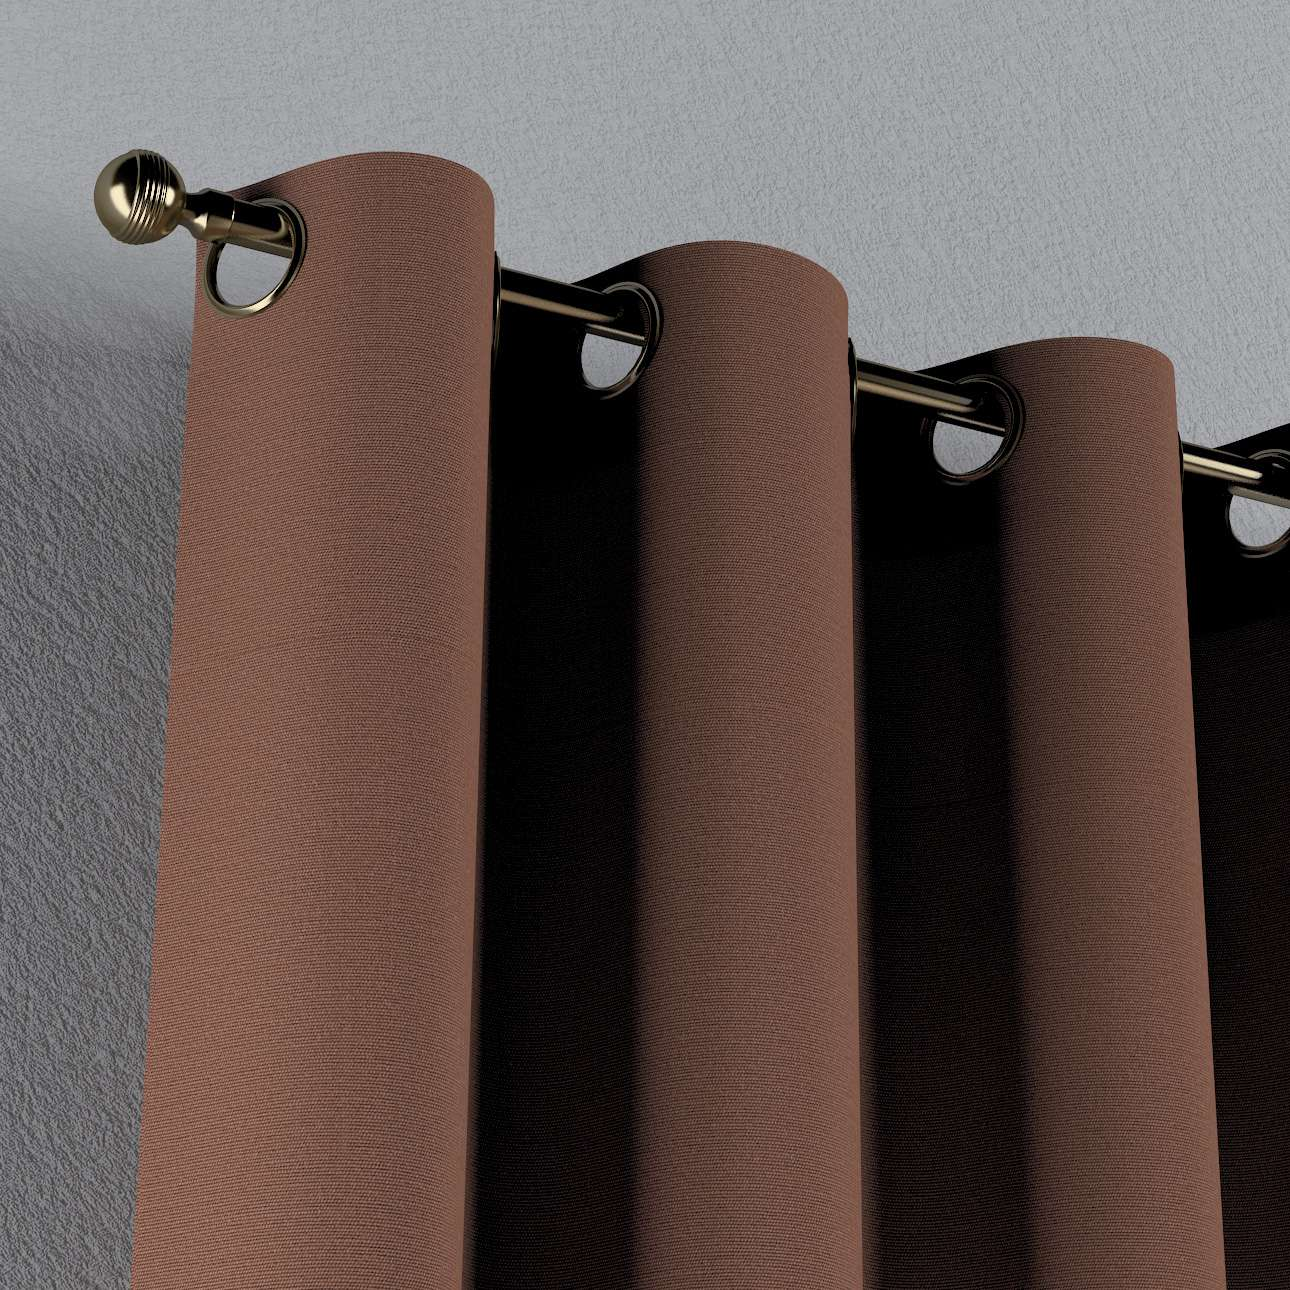 Finished curtain \u00d6sengardine monochromatic voile structure Brown 135 x 260 cm